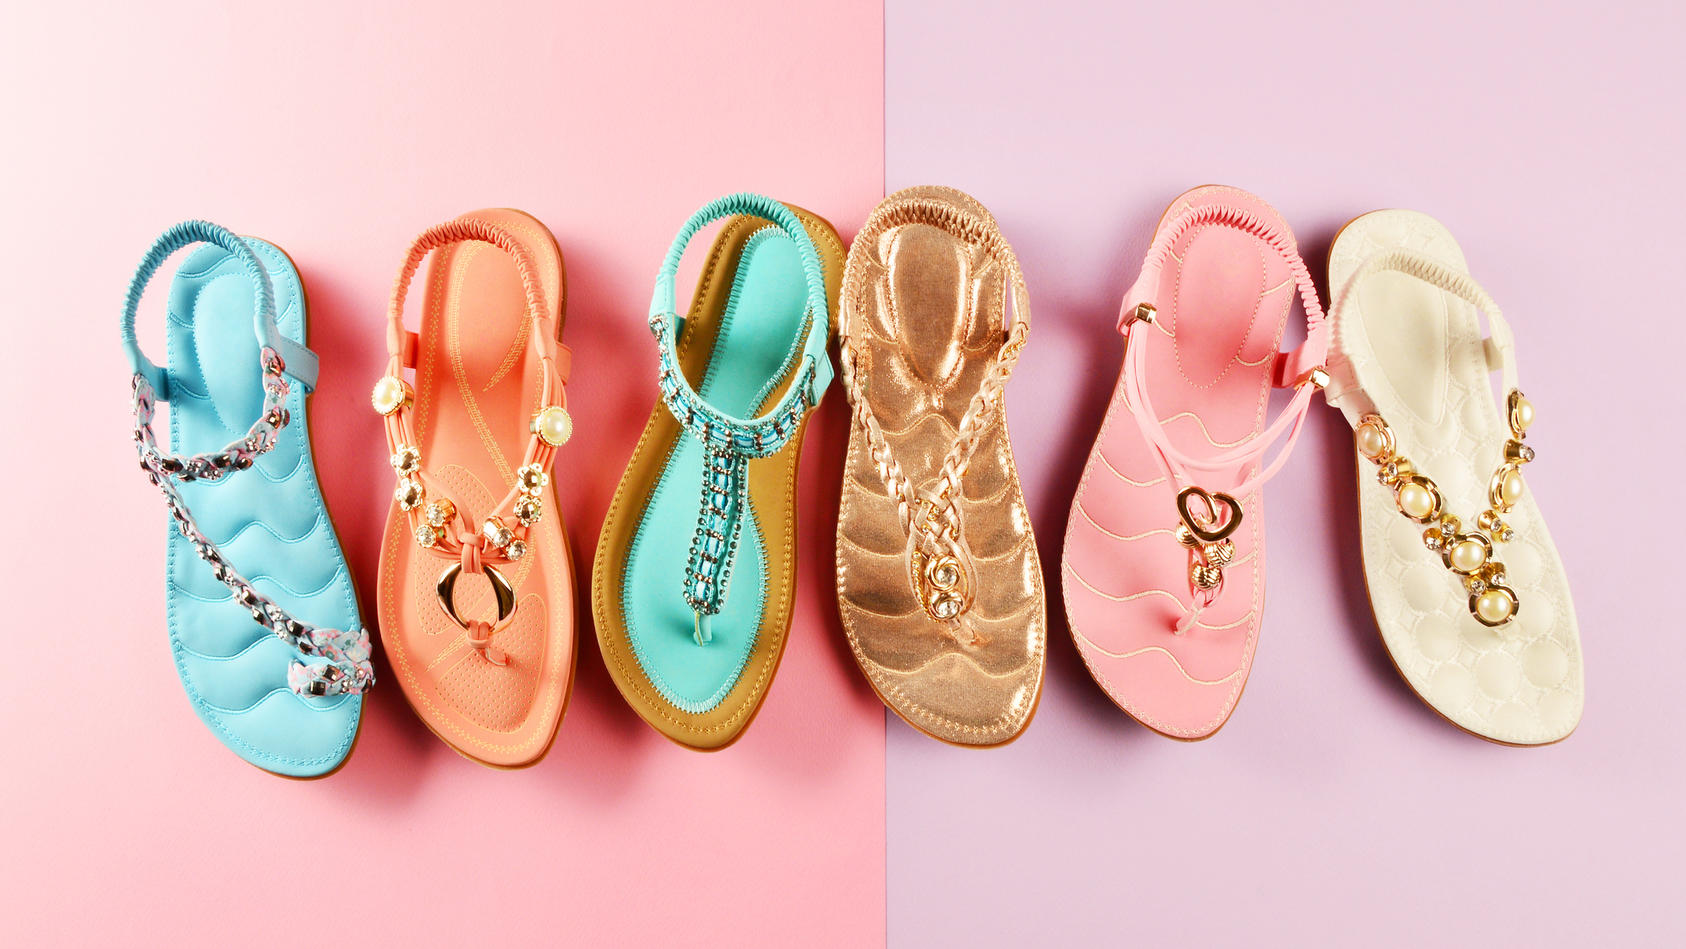 Sandalen: Können Ugly Sandals im Kampf gegen schicke Sandaletten bestehen?